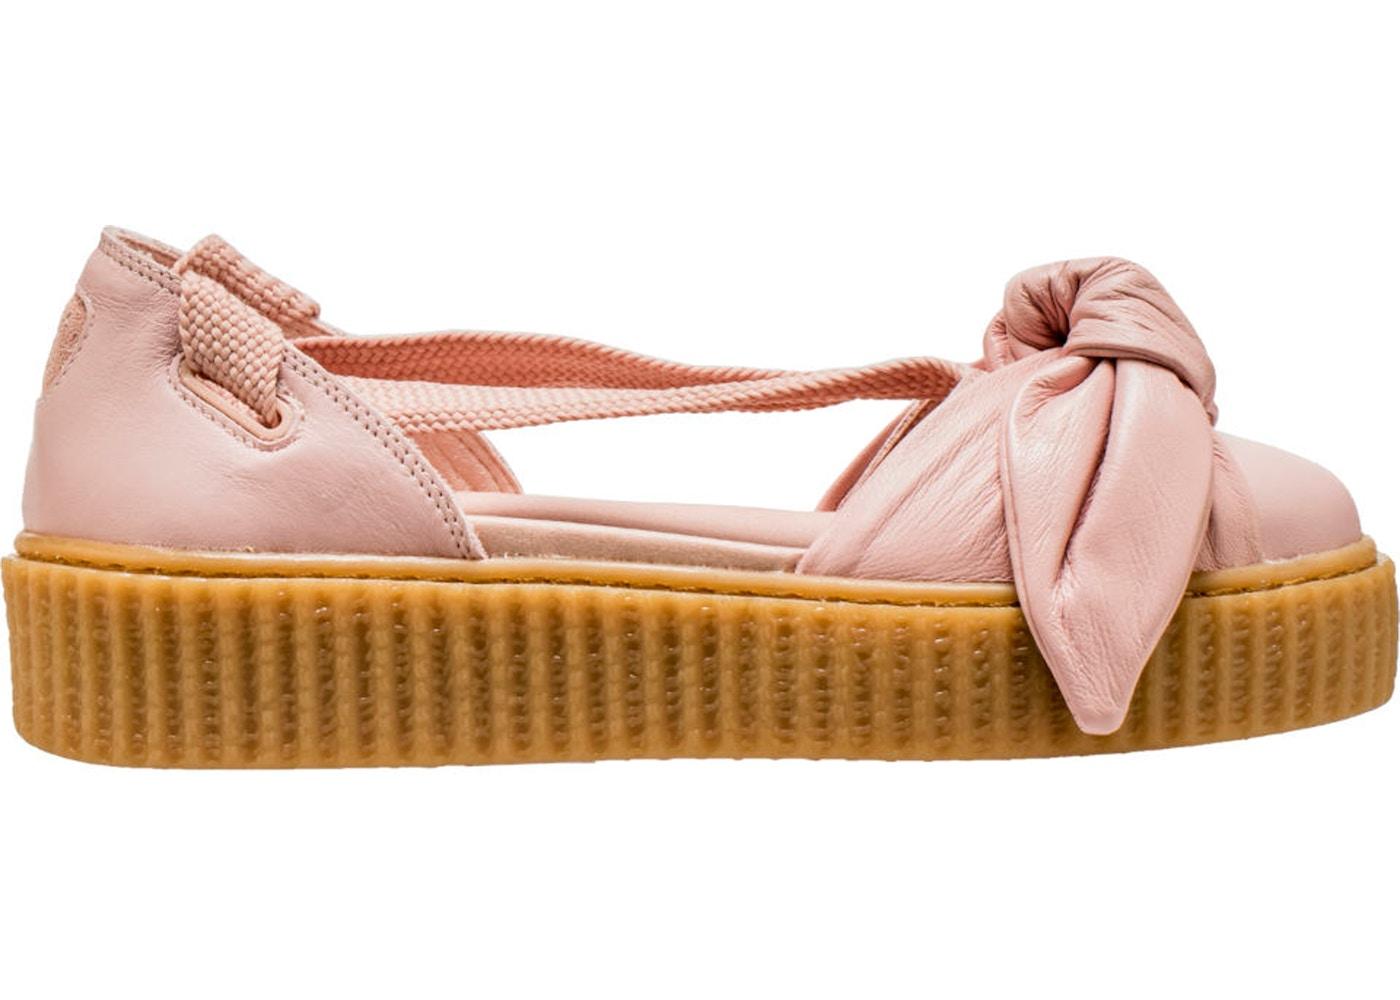 new product 0ffa6 9dd87 Sell. or Ask. Size  8W. View All Bids. Puma Bow Creeper Sandal Rihanna  Fenty Silver Pink ...